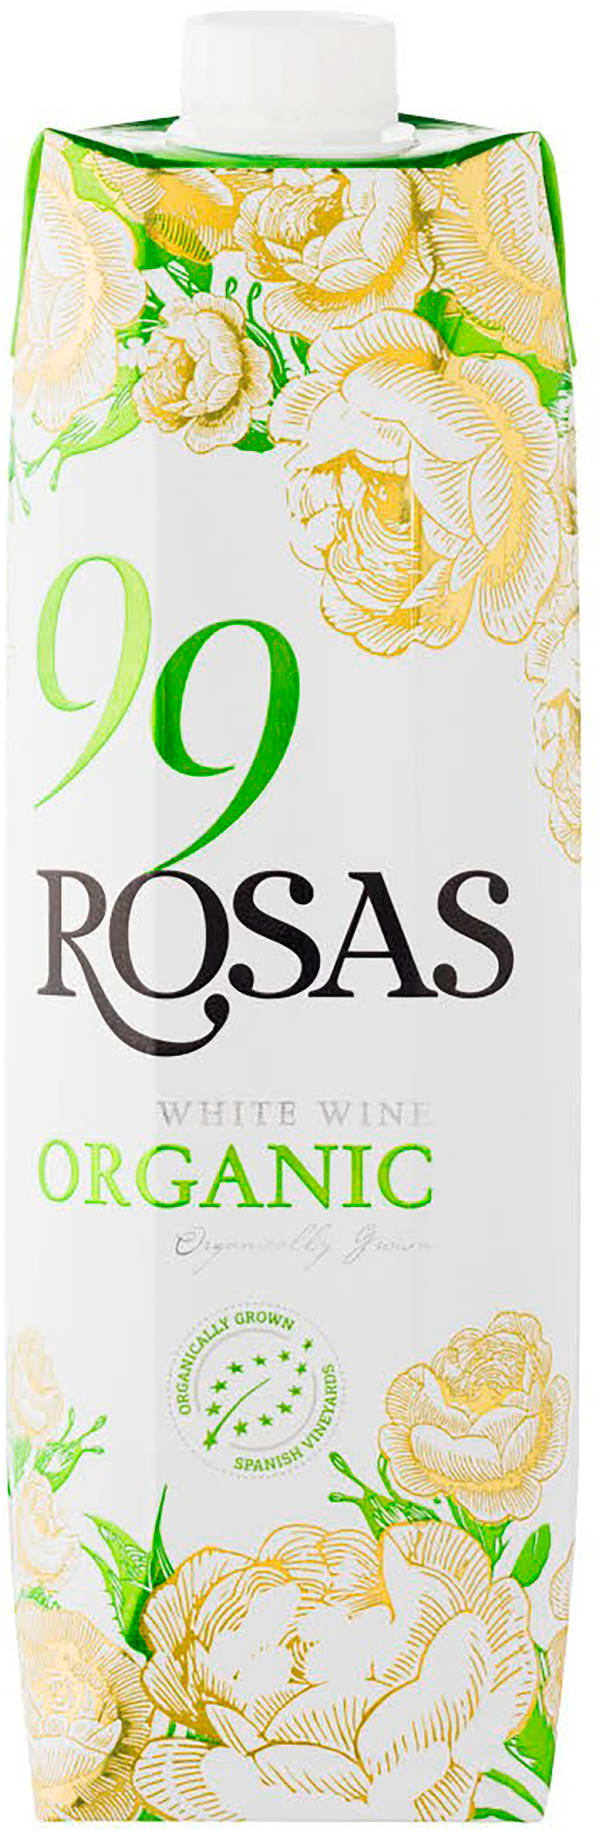 99 Rosas Organic White Wine 2018 kartongförpackning